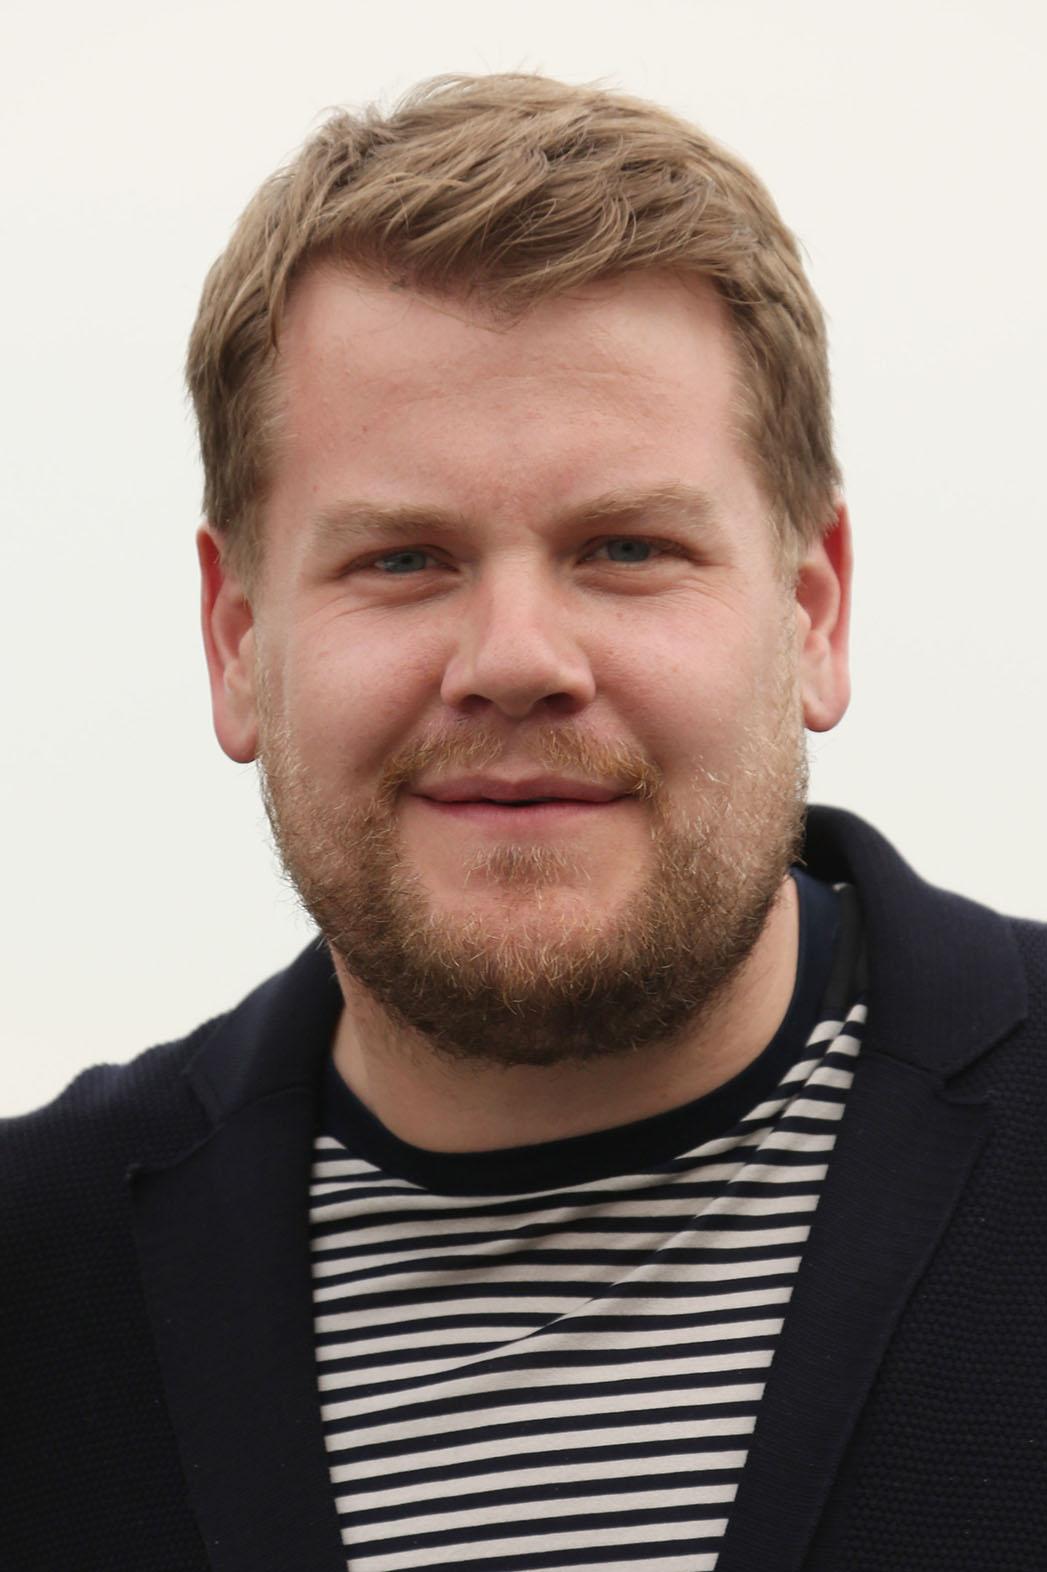 James Corden Headshot - P 2014